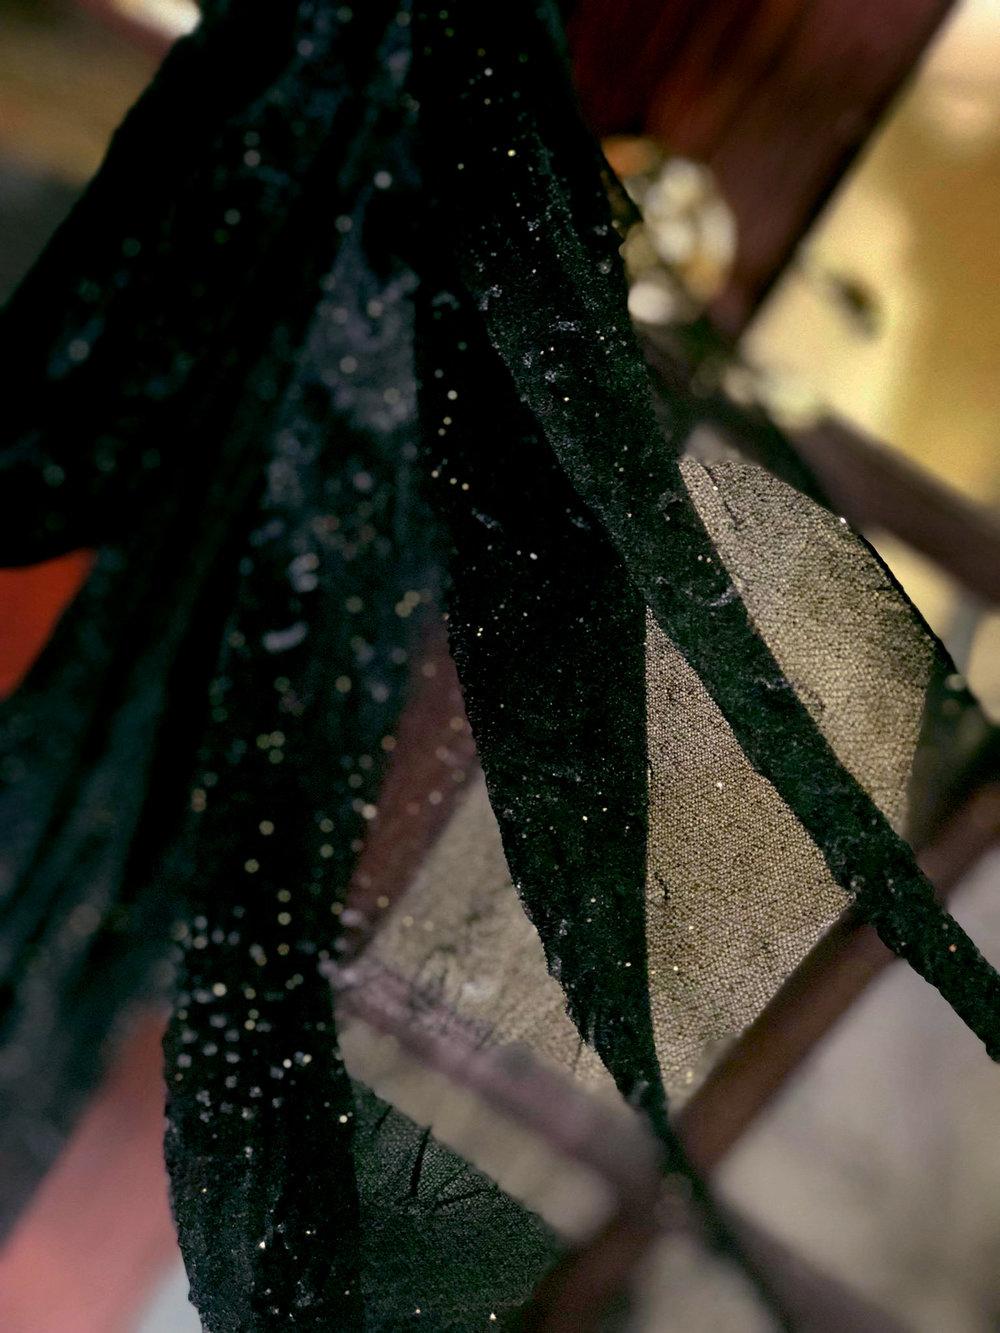 blacksparkles.jpg